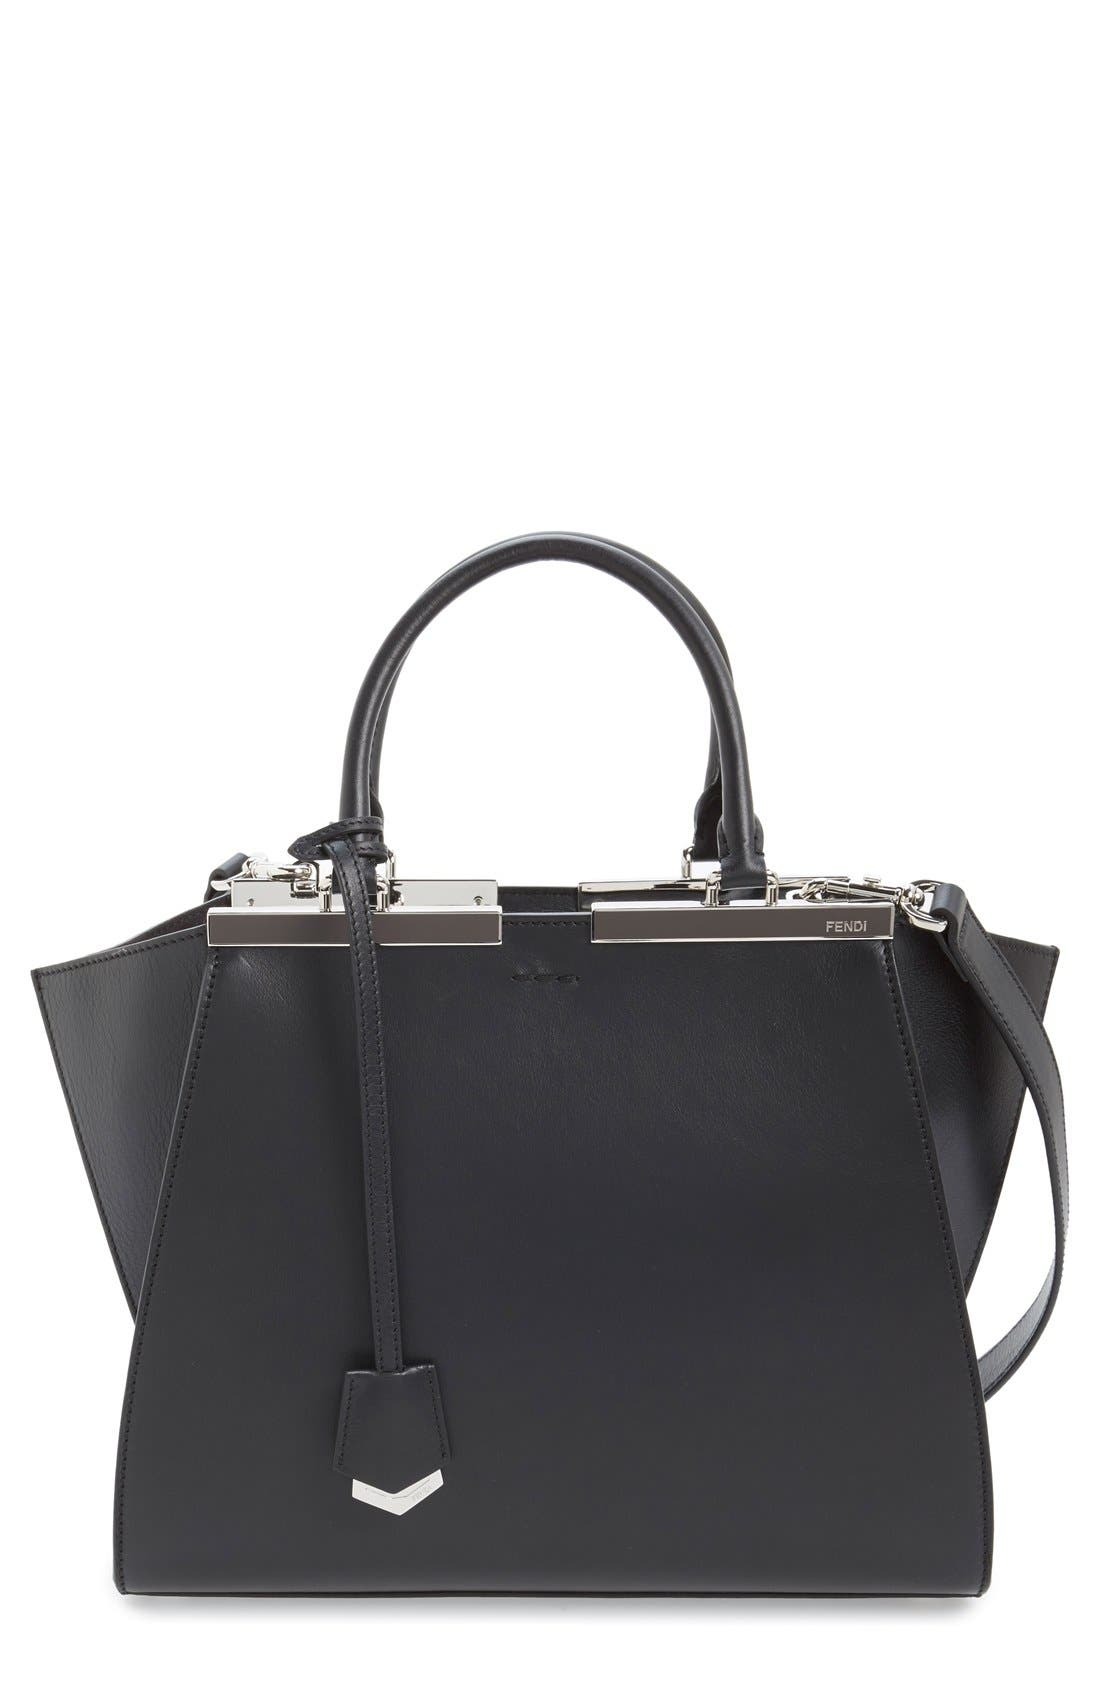 Alternate Image 1 Selected - Fendi '3Jours' Leather Shopper